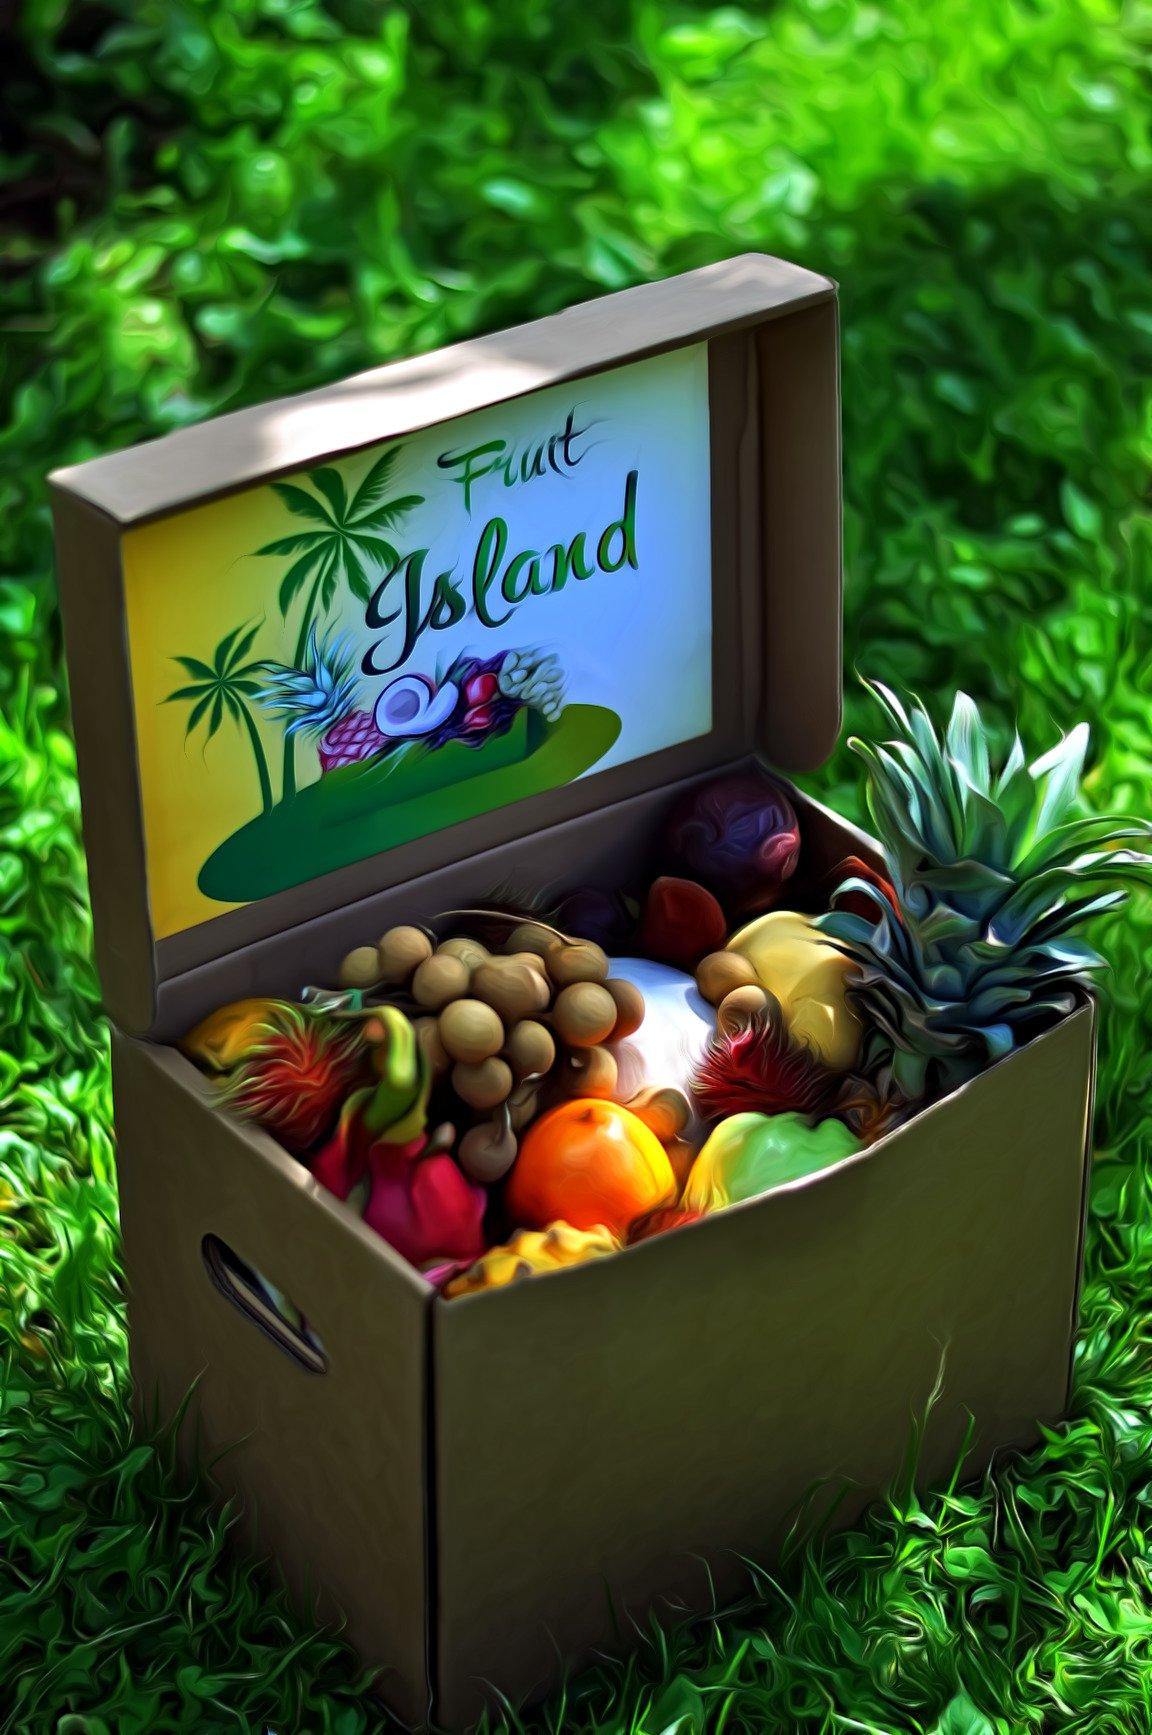 http://fruit-island.ru/images/upload/imgonline-com-ua-FairyTale-Z1ZcpkRpUjXS.jpg